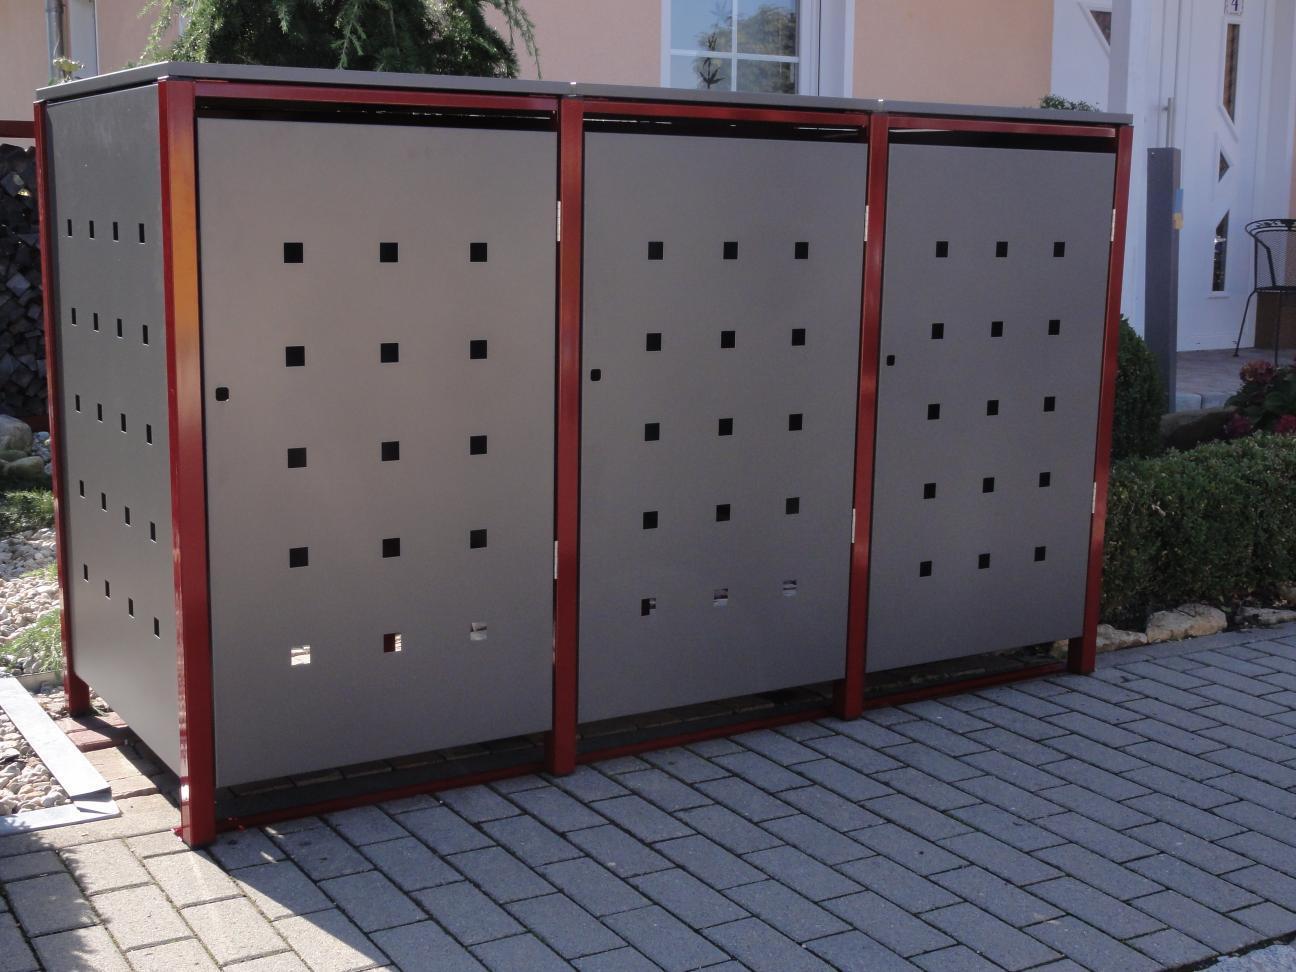 m lltonnenboxen aus metall langlebig und sch n f r m lltonnen. Black Bedroom Furniture Sets. Home Design Ideas